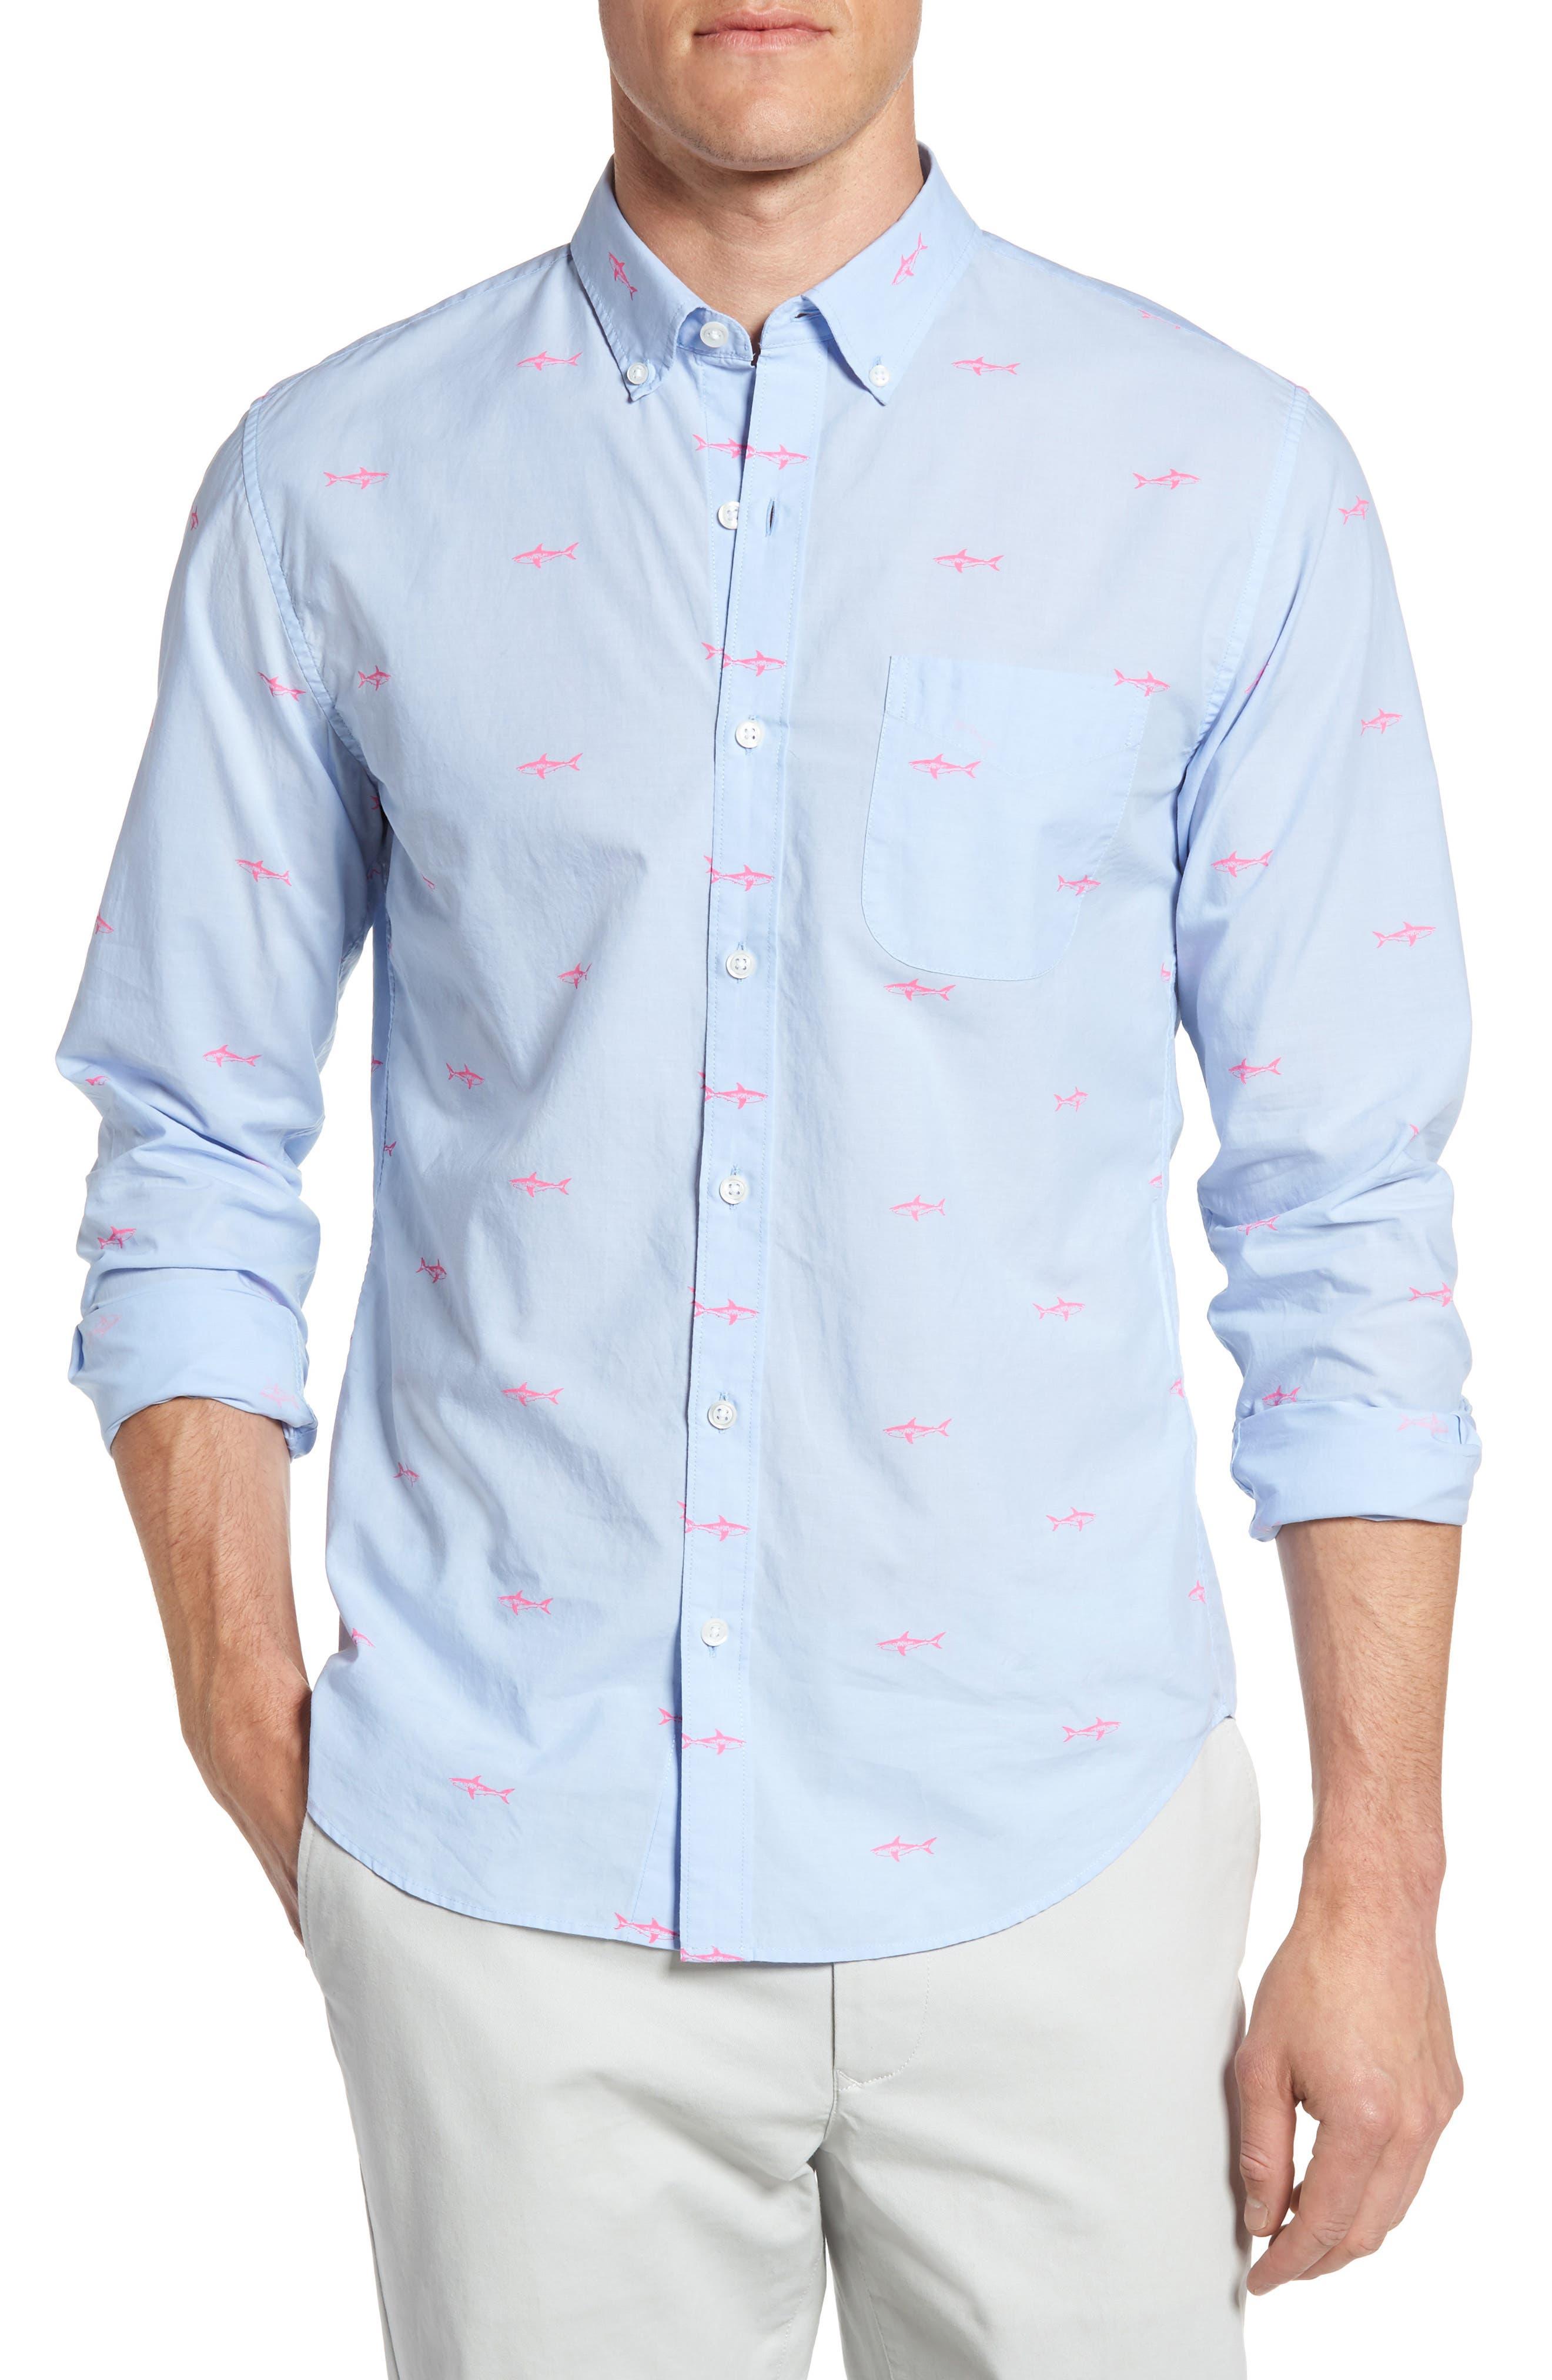 Main Image - Bonobos Slim Fit Summerweight Shark Print Sport Shirt